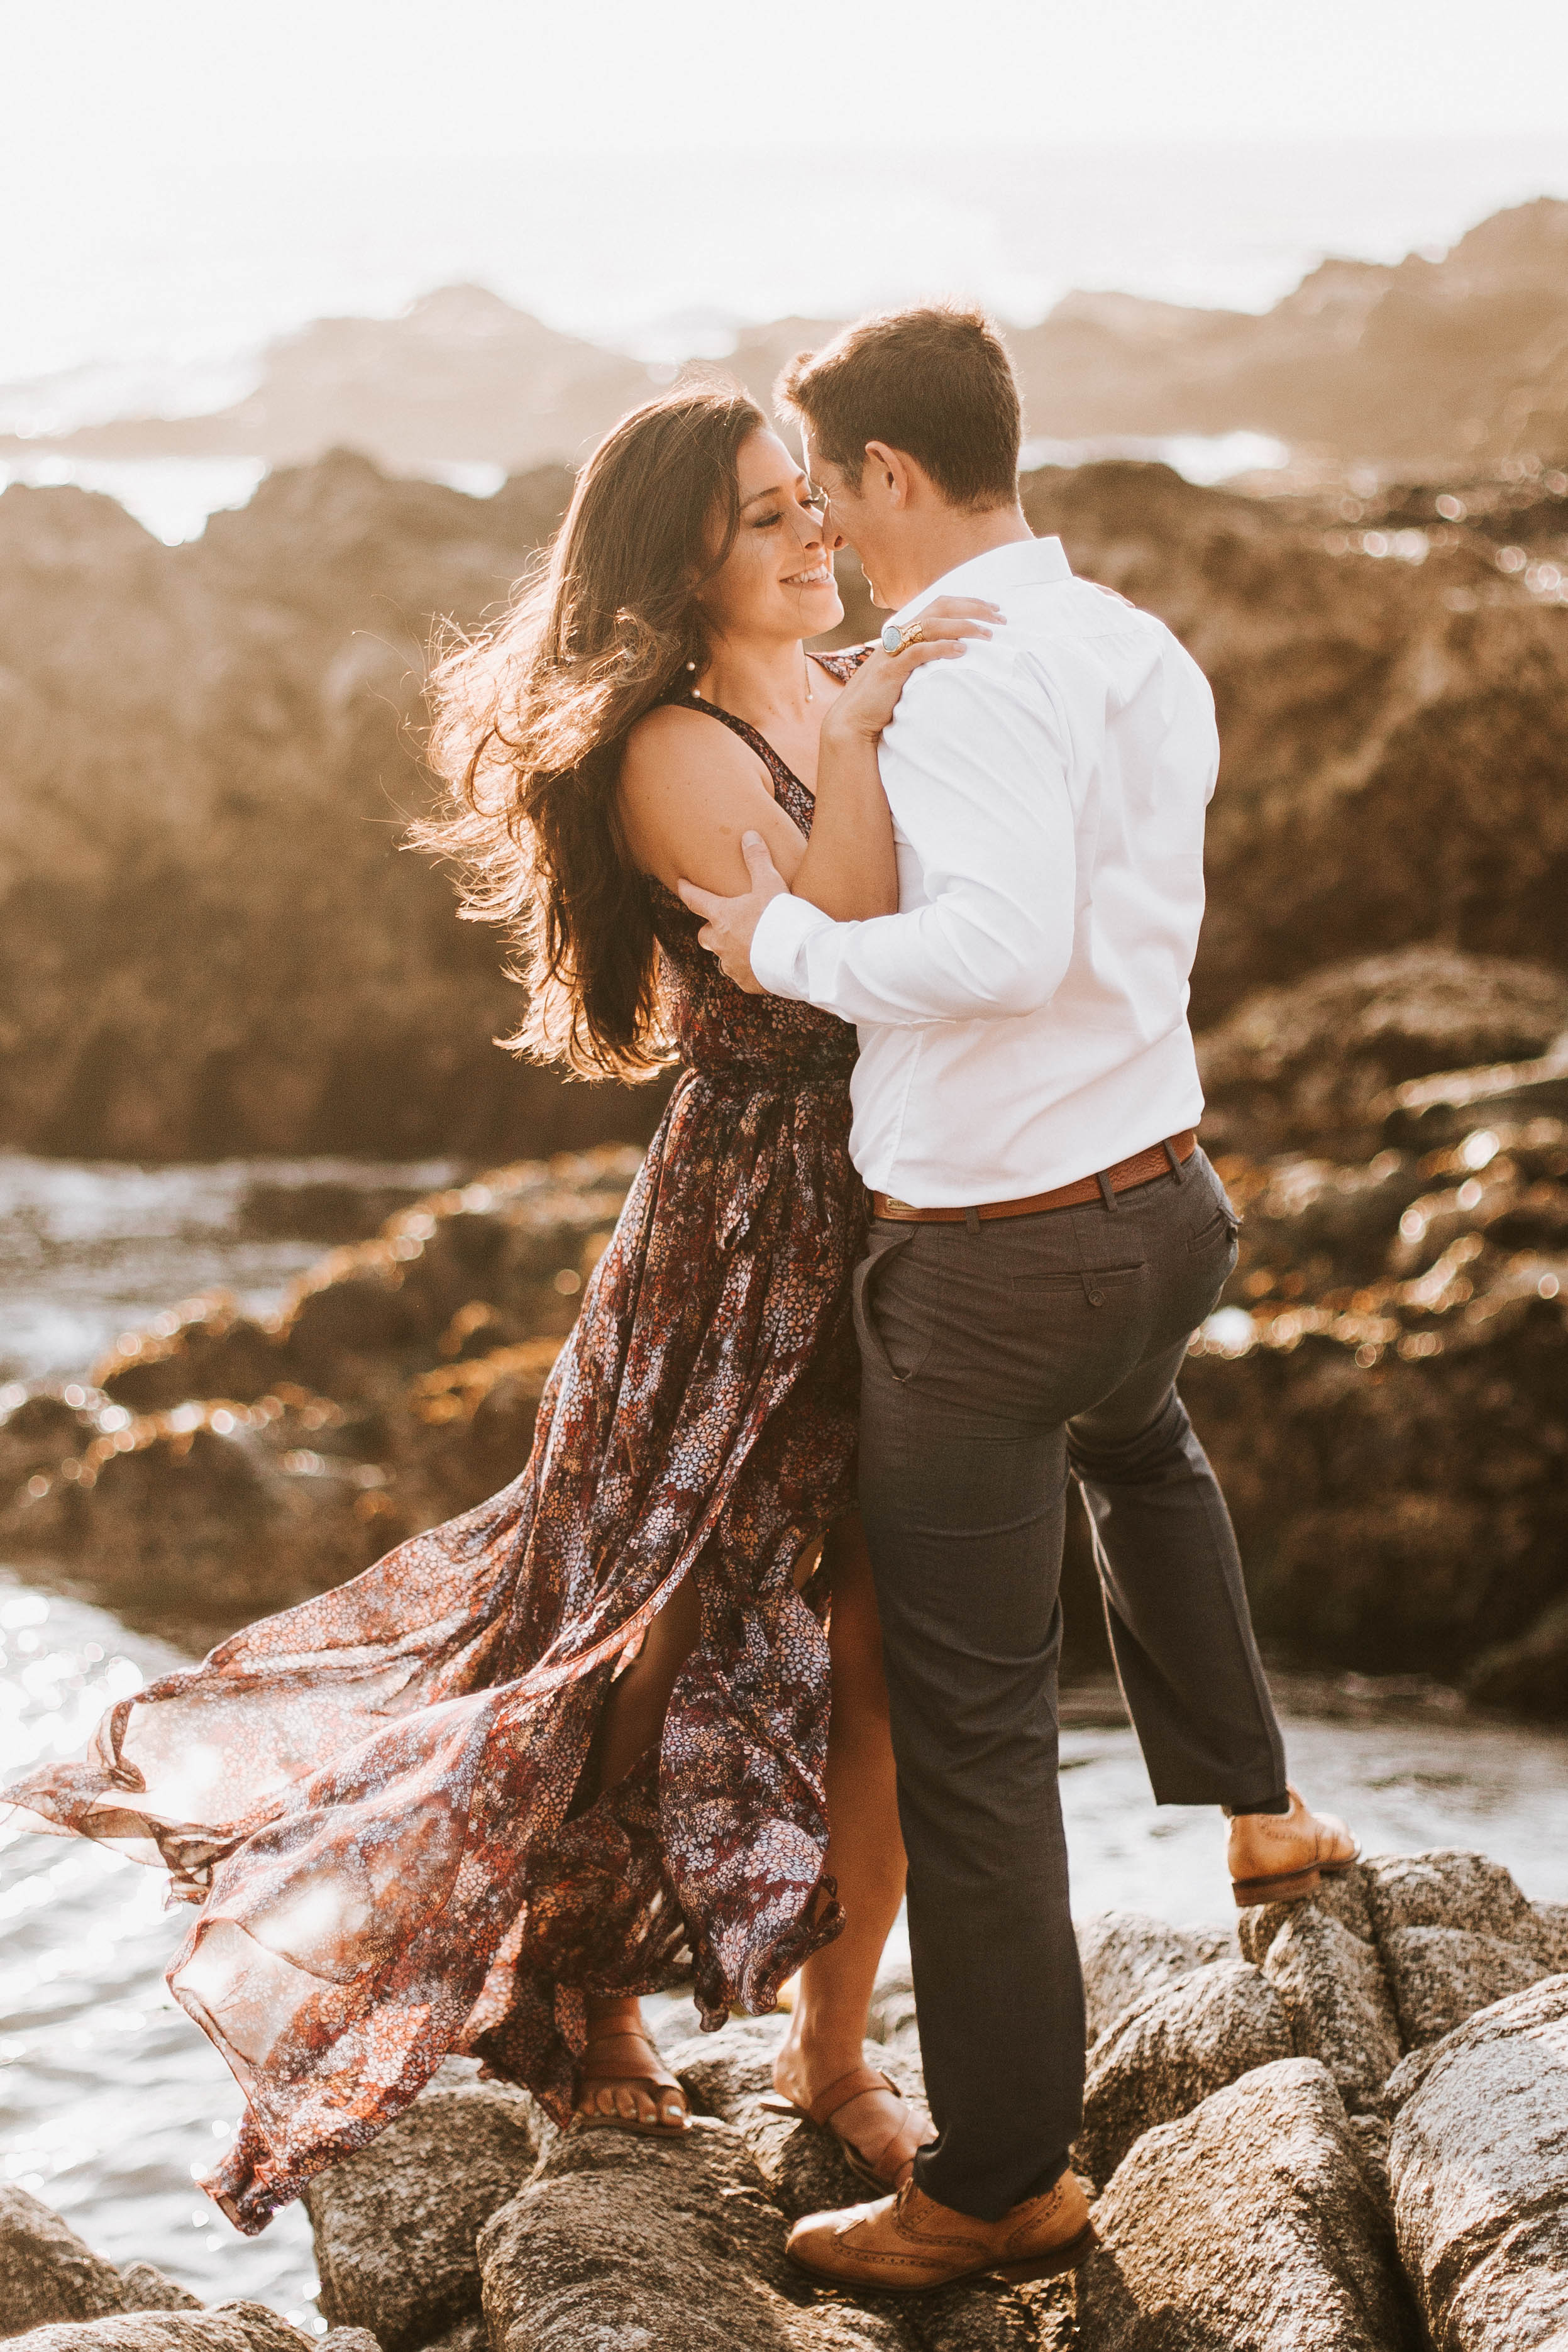 nicole-daacke-photography-big-sur-california-coast-adventure-engagement-photos-adventurous-elopement-intimate-wedding-photographer-golden-coastal-cali-engagement-session-14.jpg